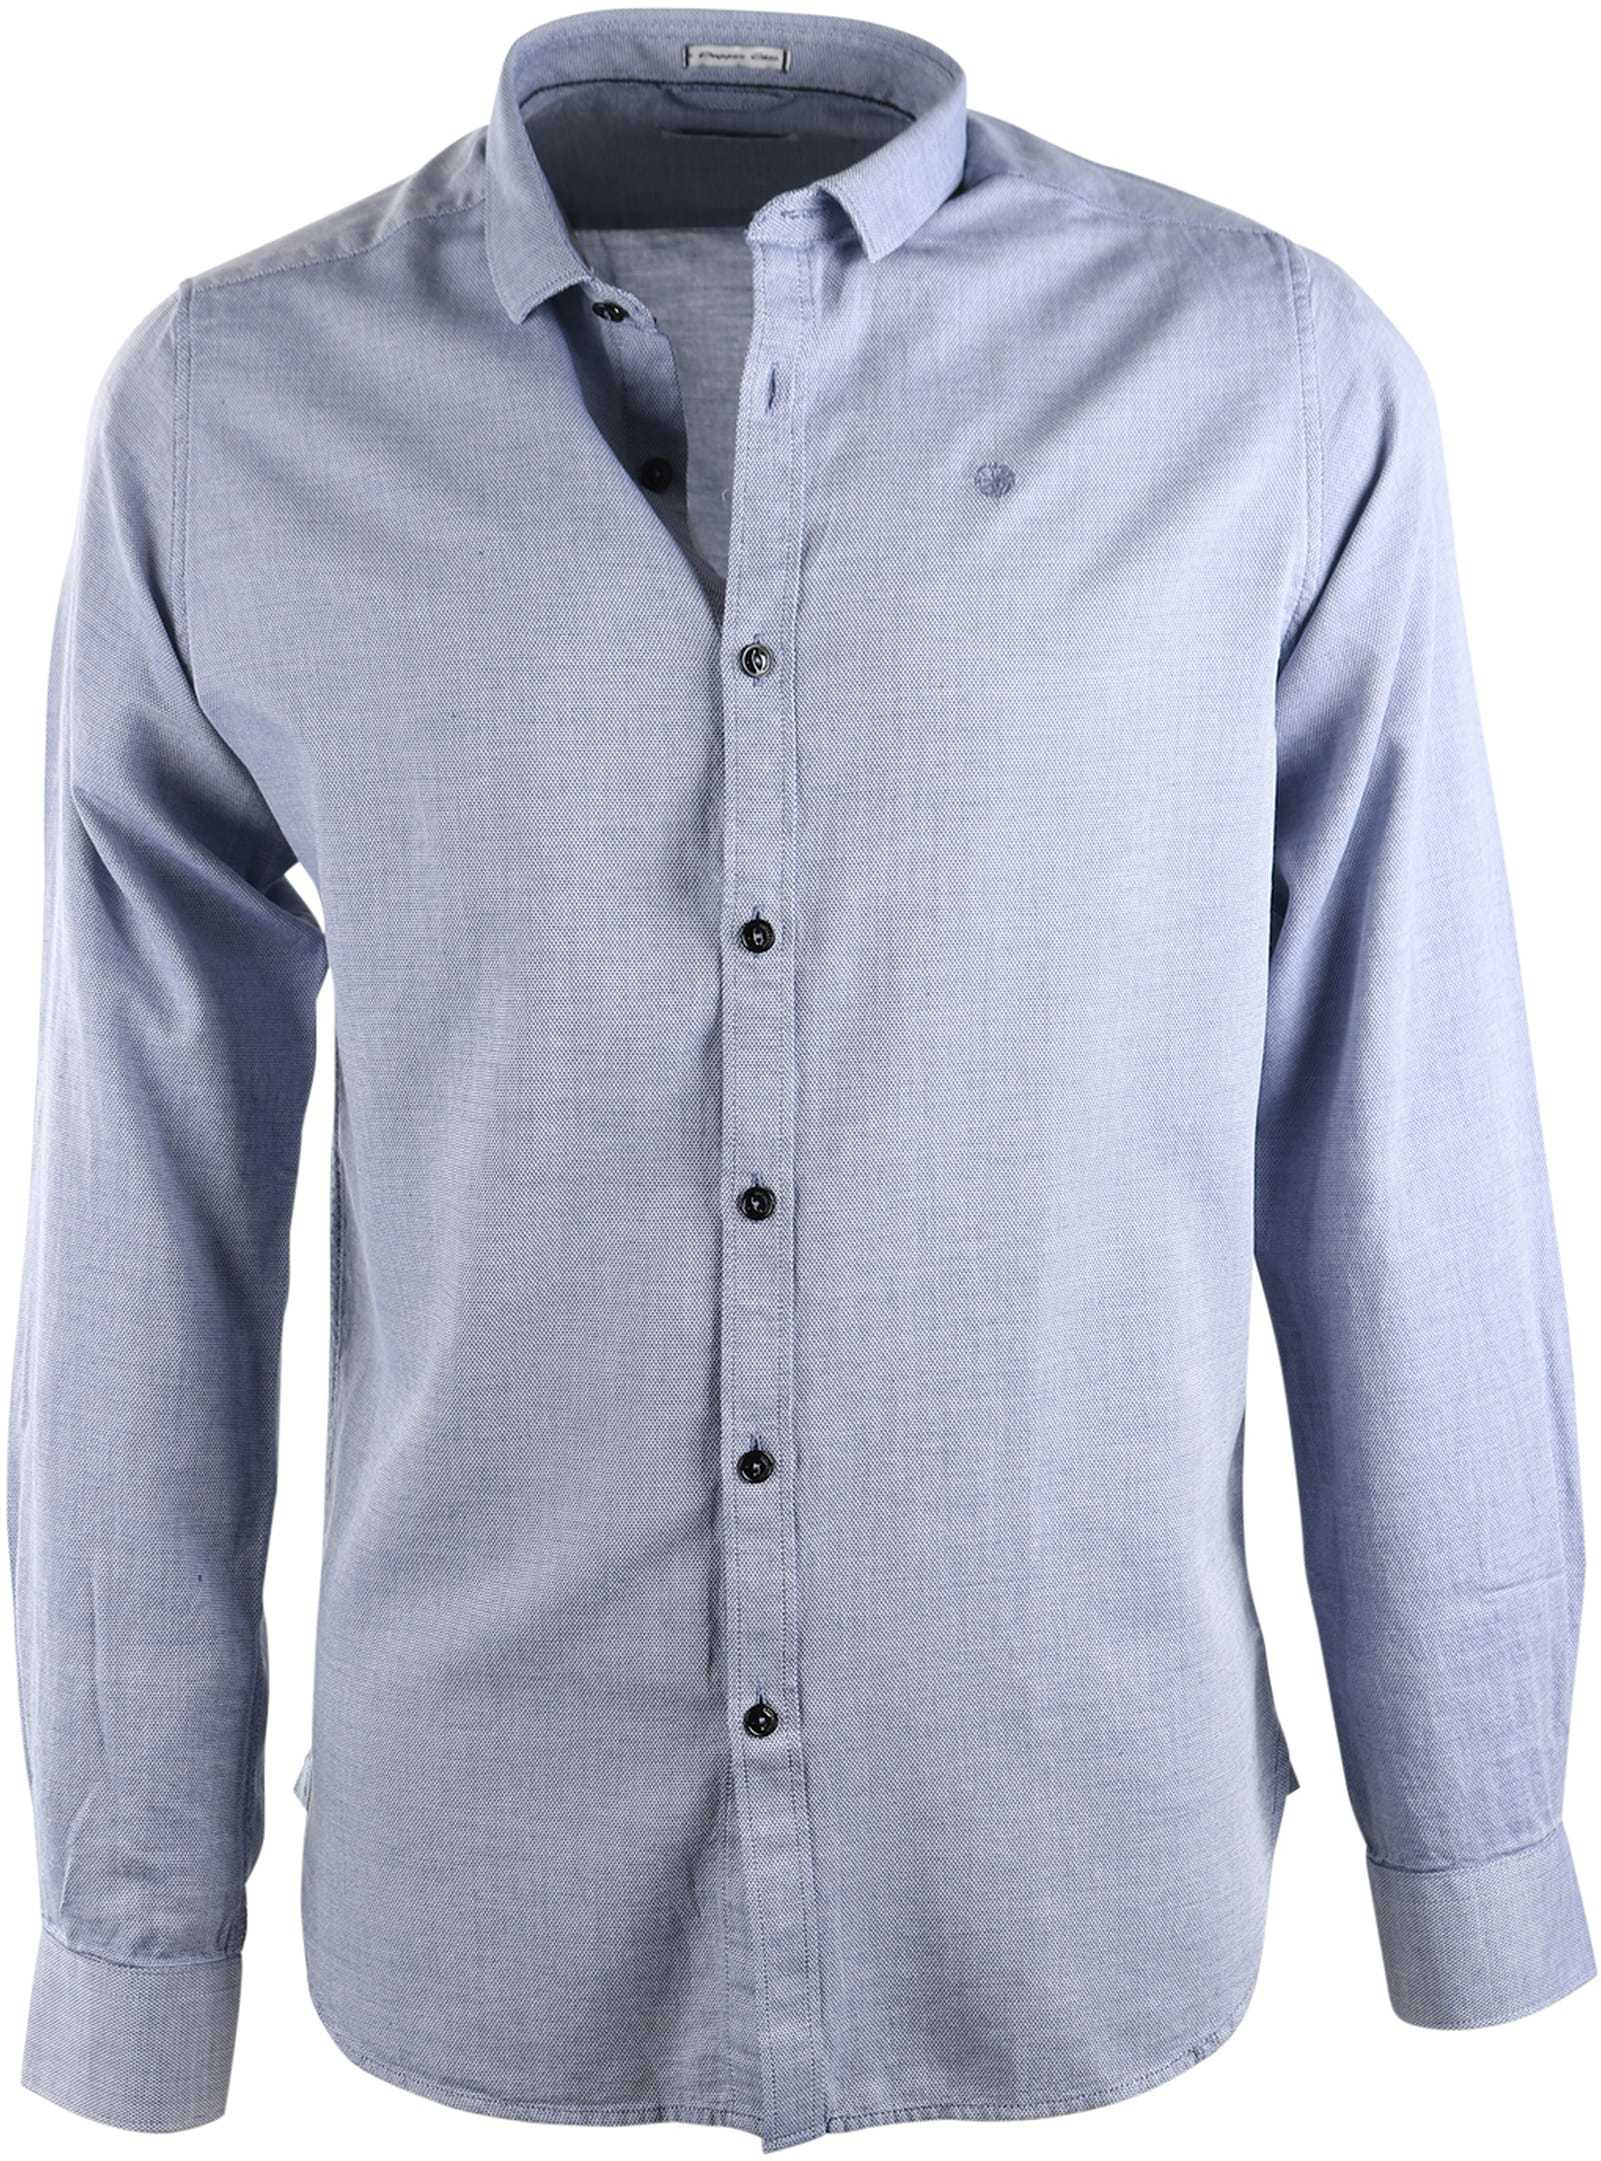 Dstrezzed Overhemd Blauw foto 0